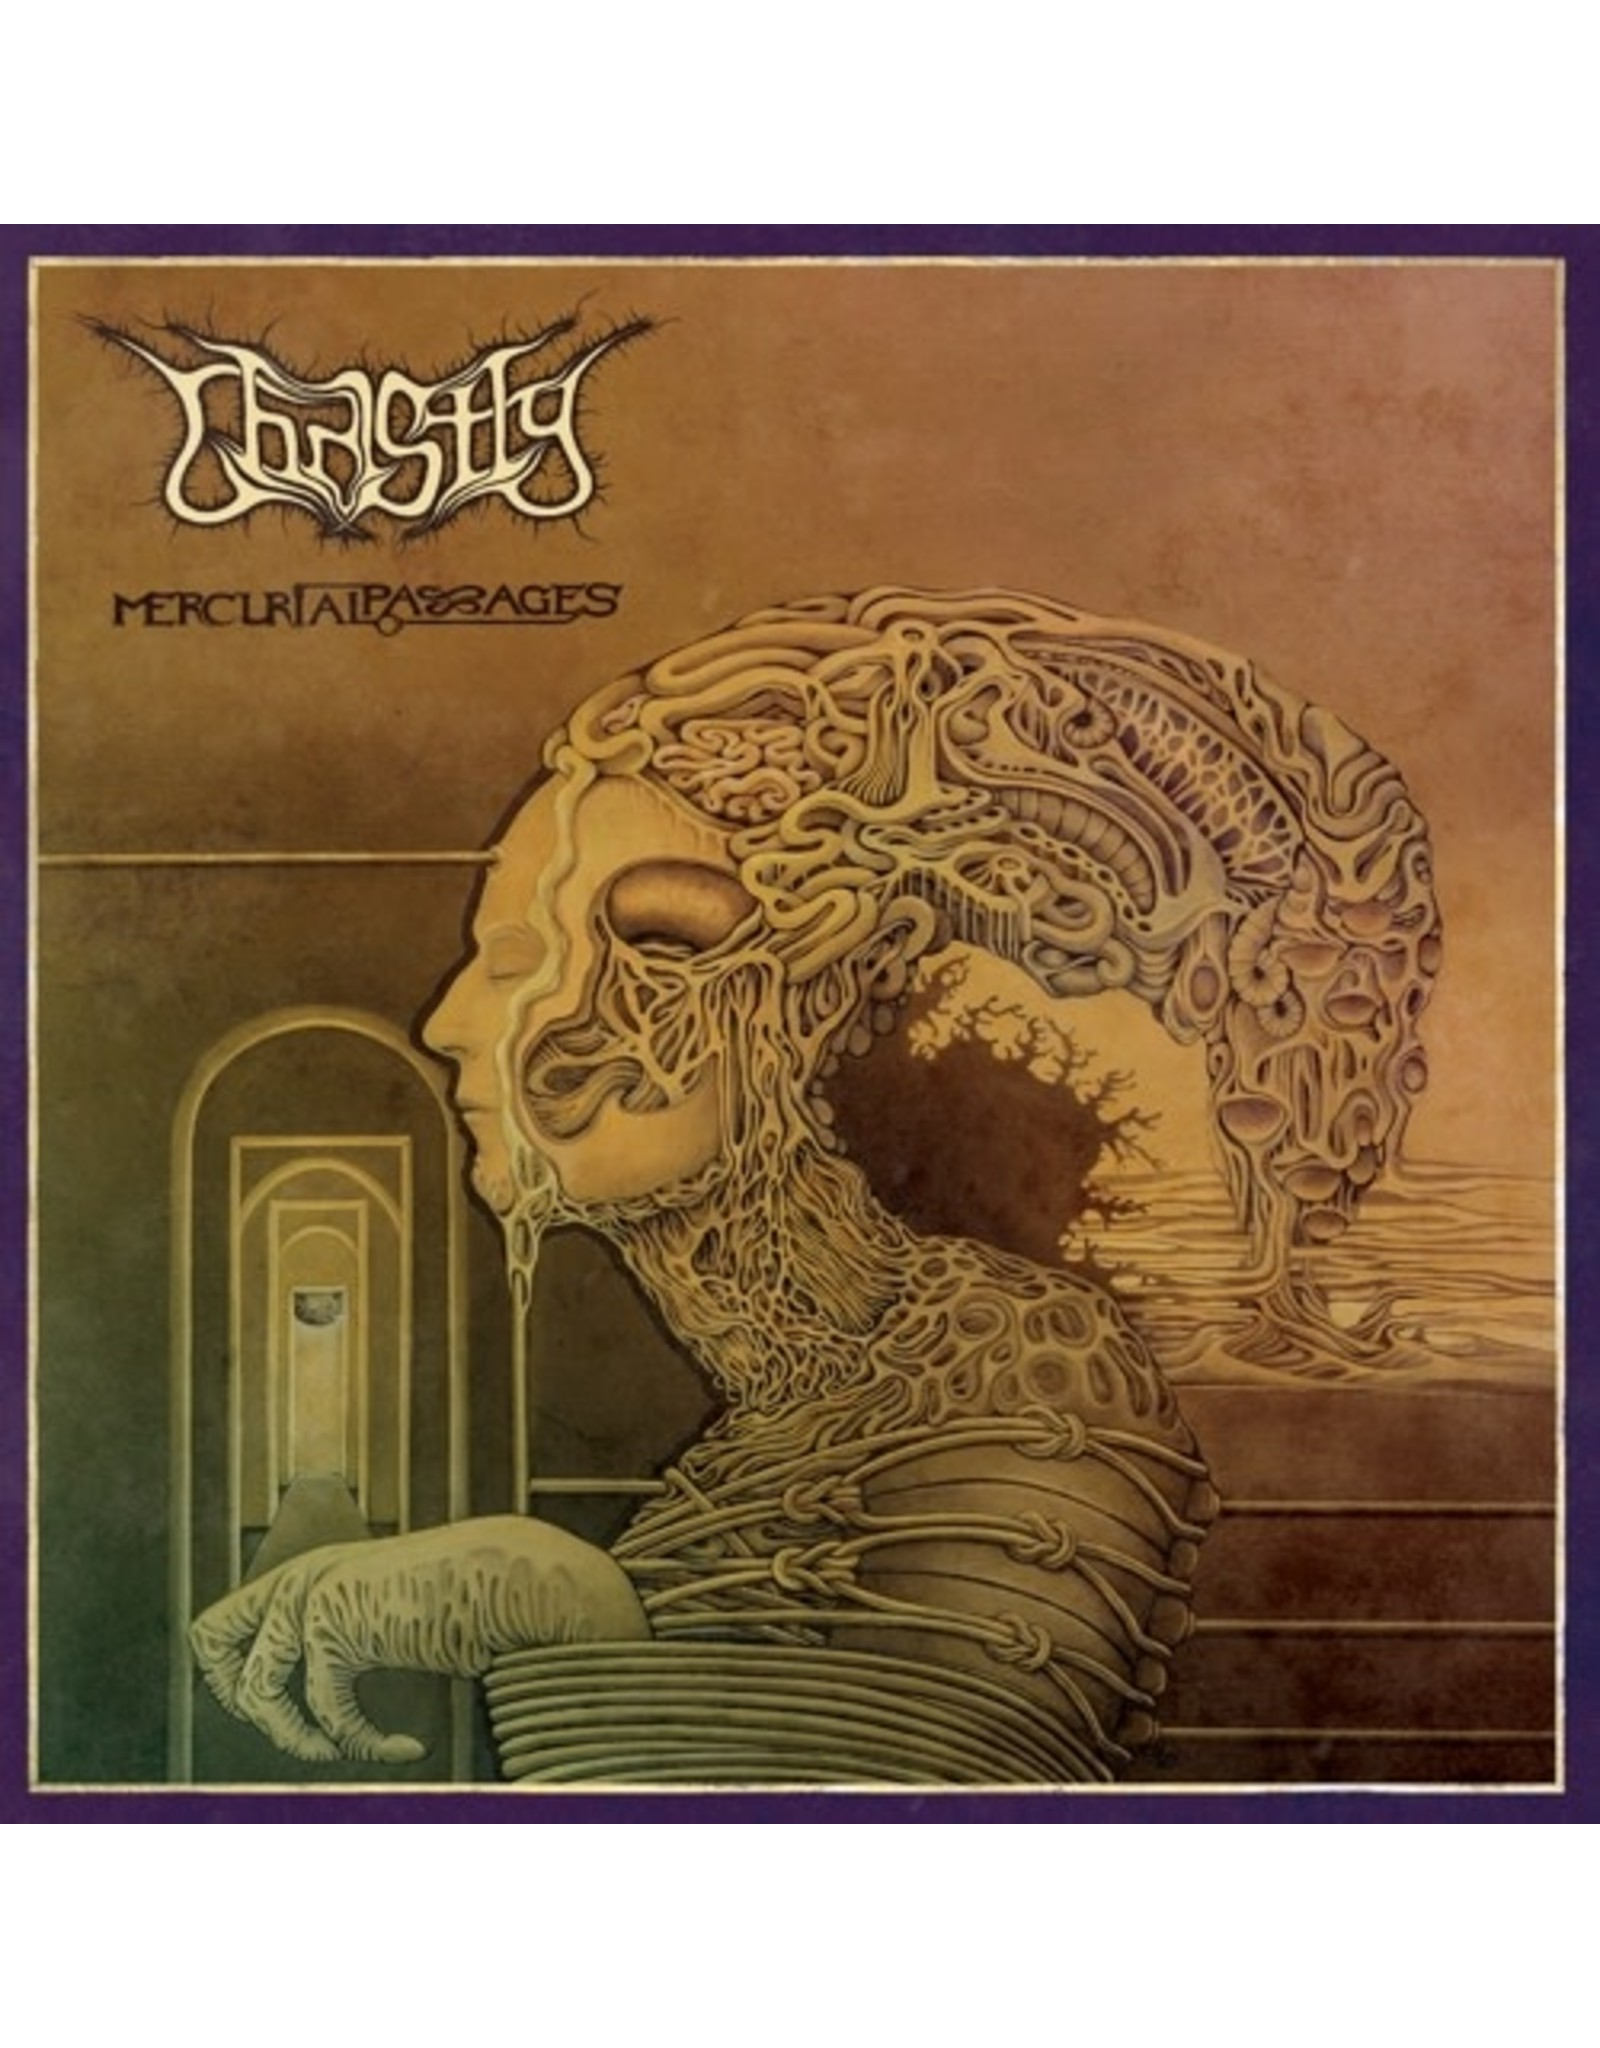 New Vinyl Ghastly - Mercurial Passages LP